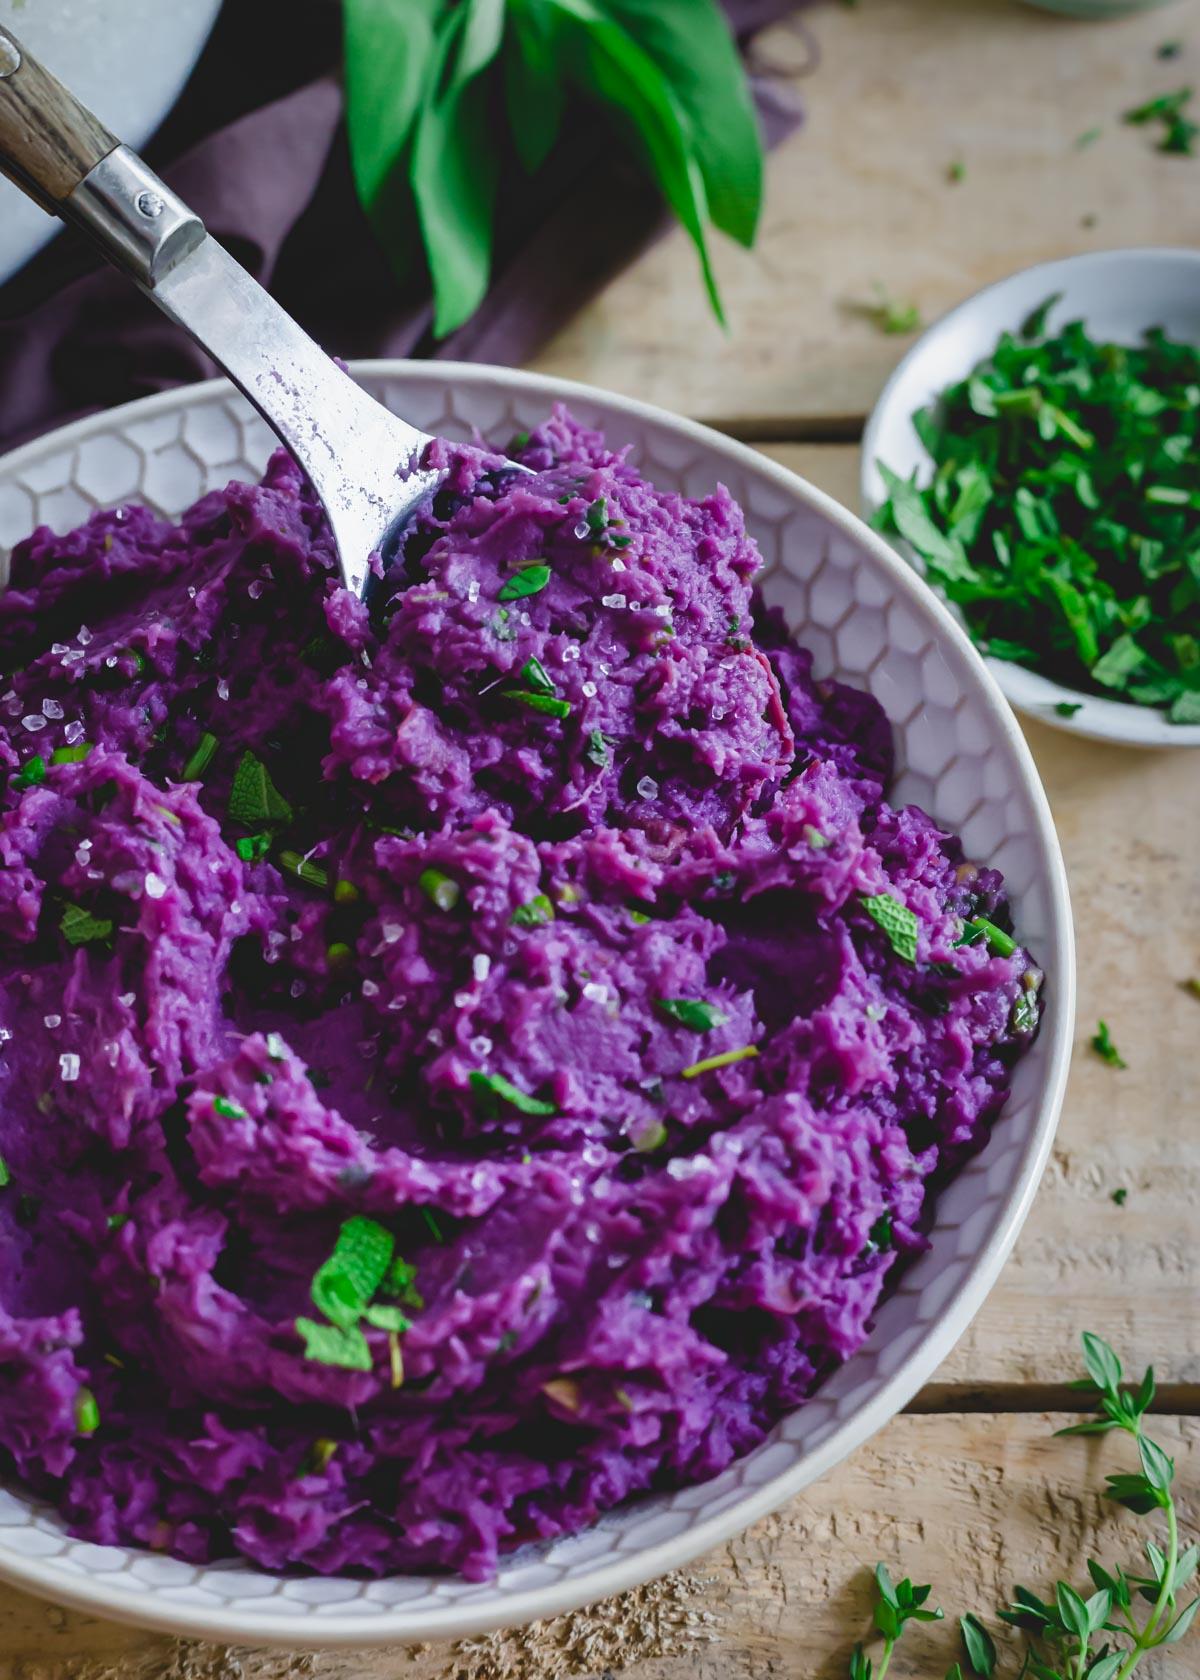 Spoonful of purple mashed sweet potatoes.